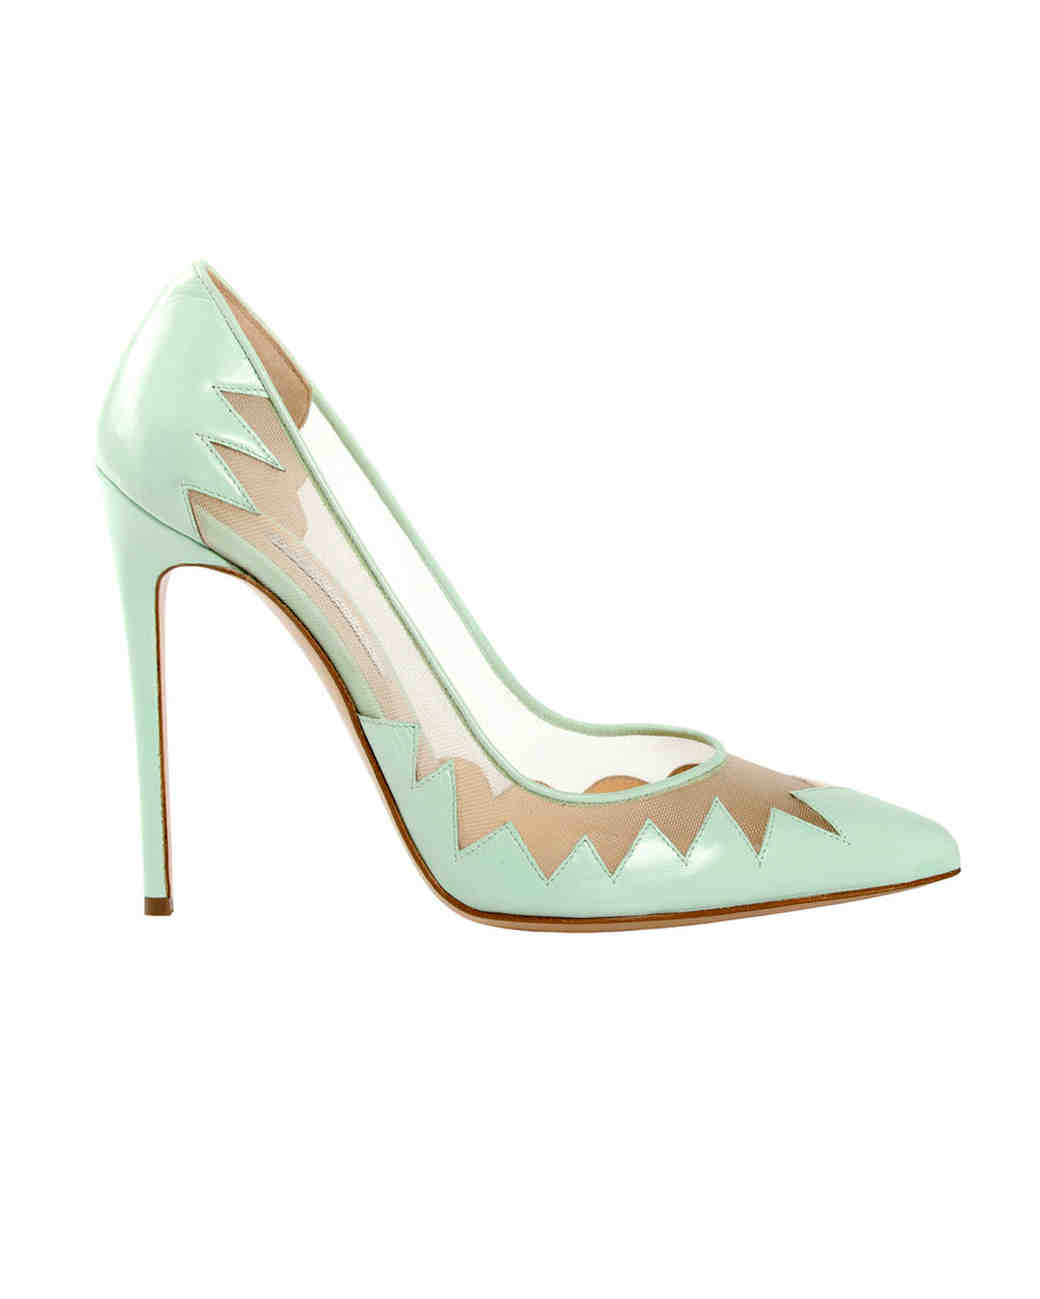 mesh-wedding-shoes-bionda-castana-leandra-pump-0315.jpg